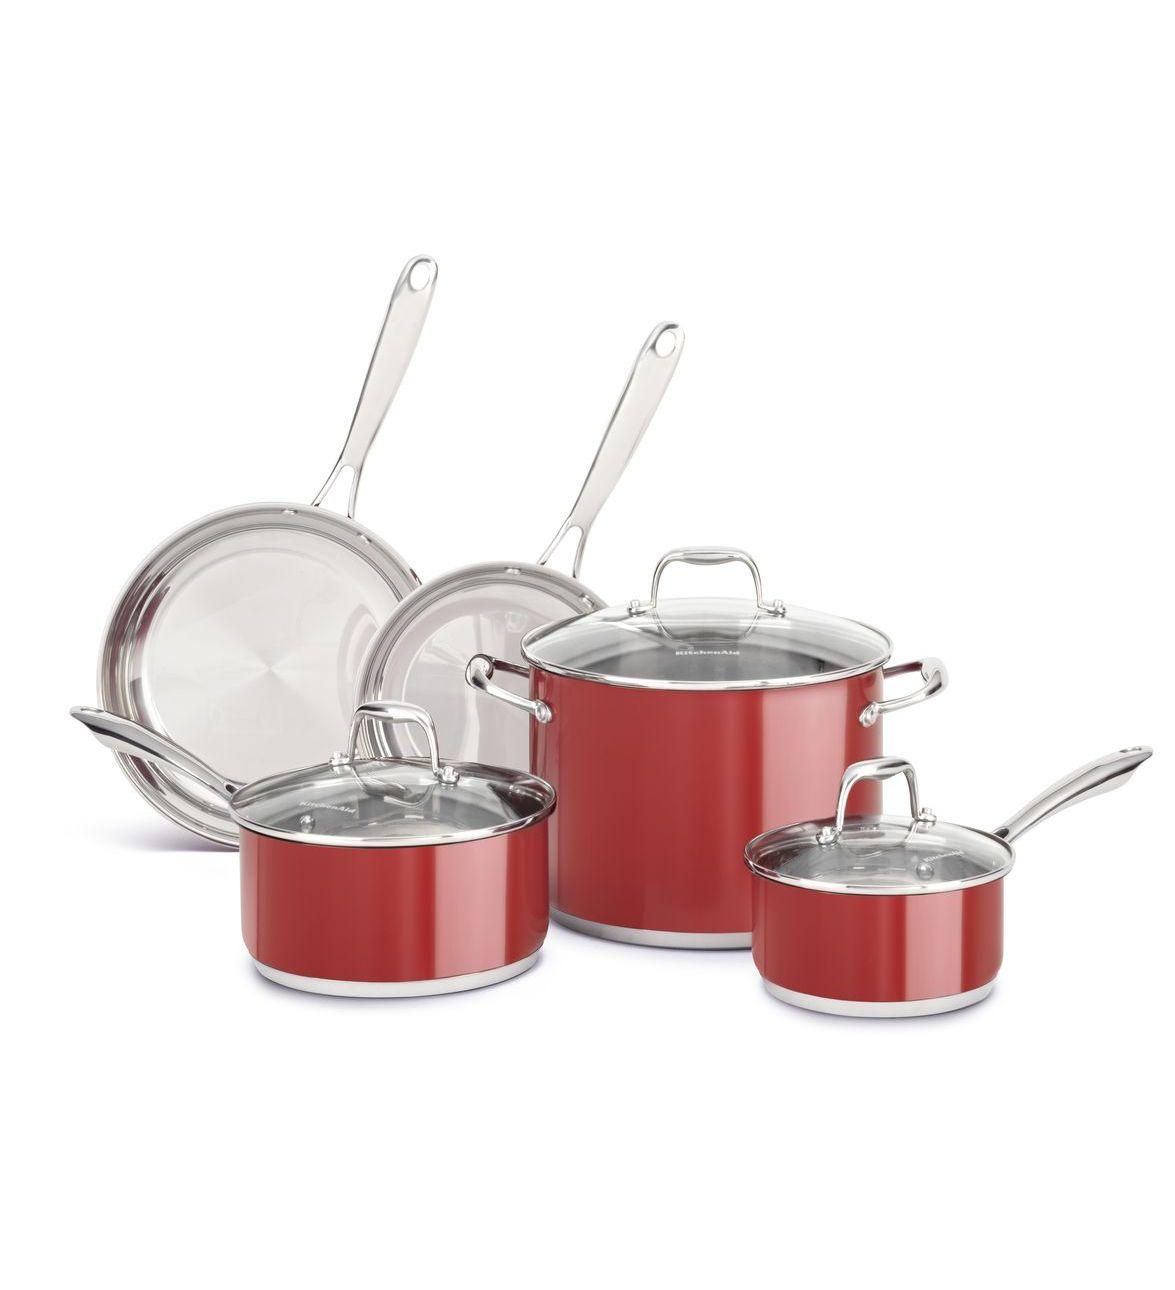 kitchenaid cookware set